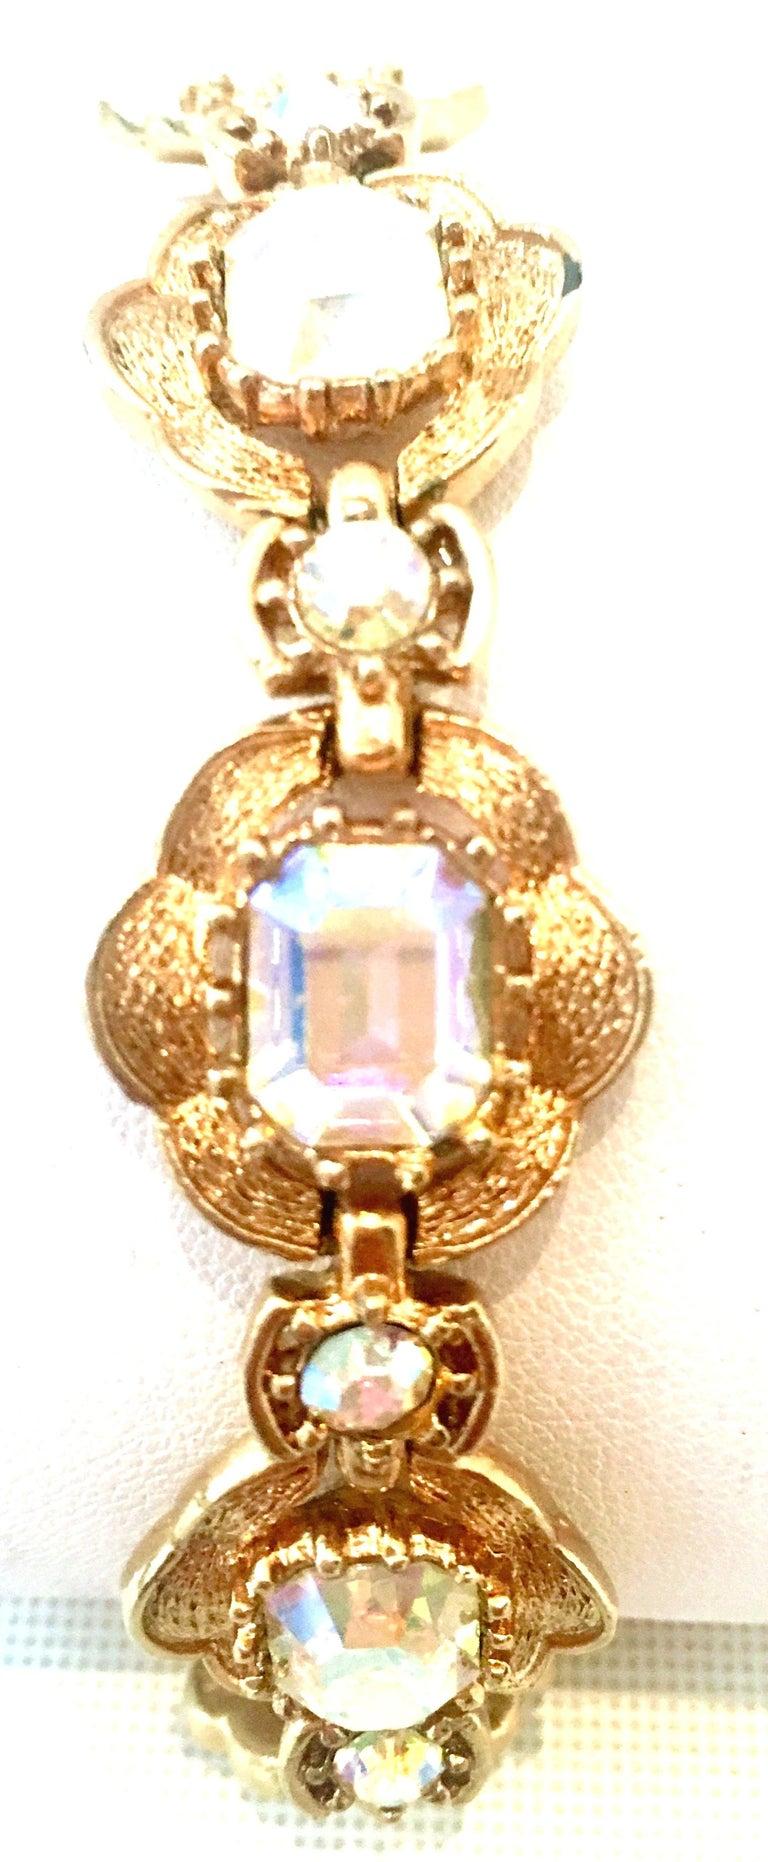 Women's or Men's 20th Century Gold & Swarovski Crystal Link Style Bracelet By, Coro For Sale